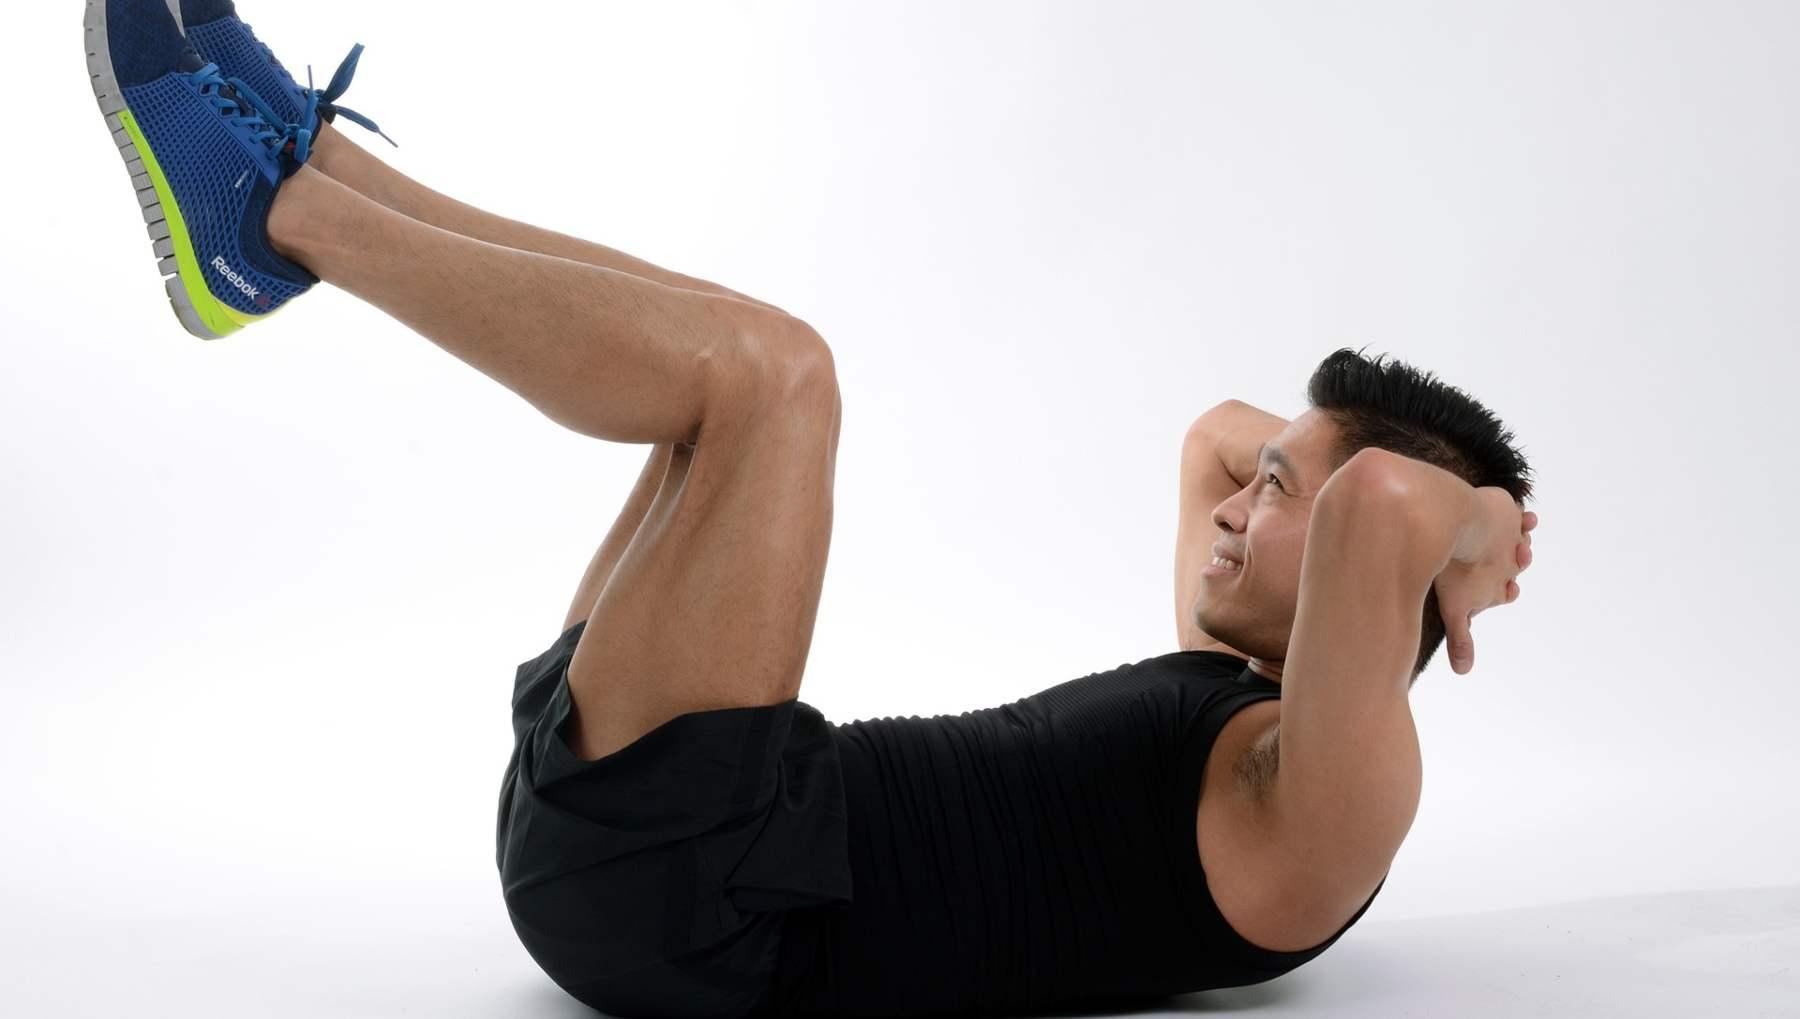 Técnica de vacío abdominal